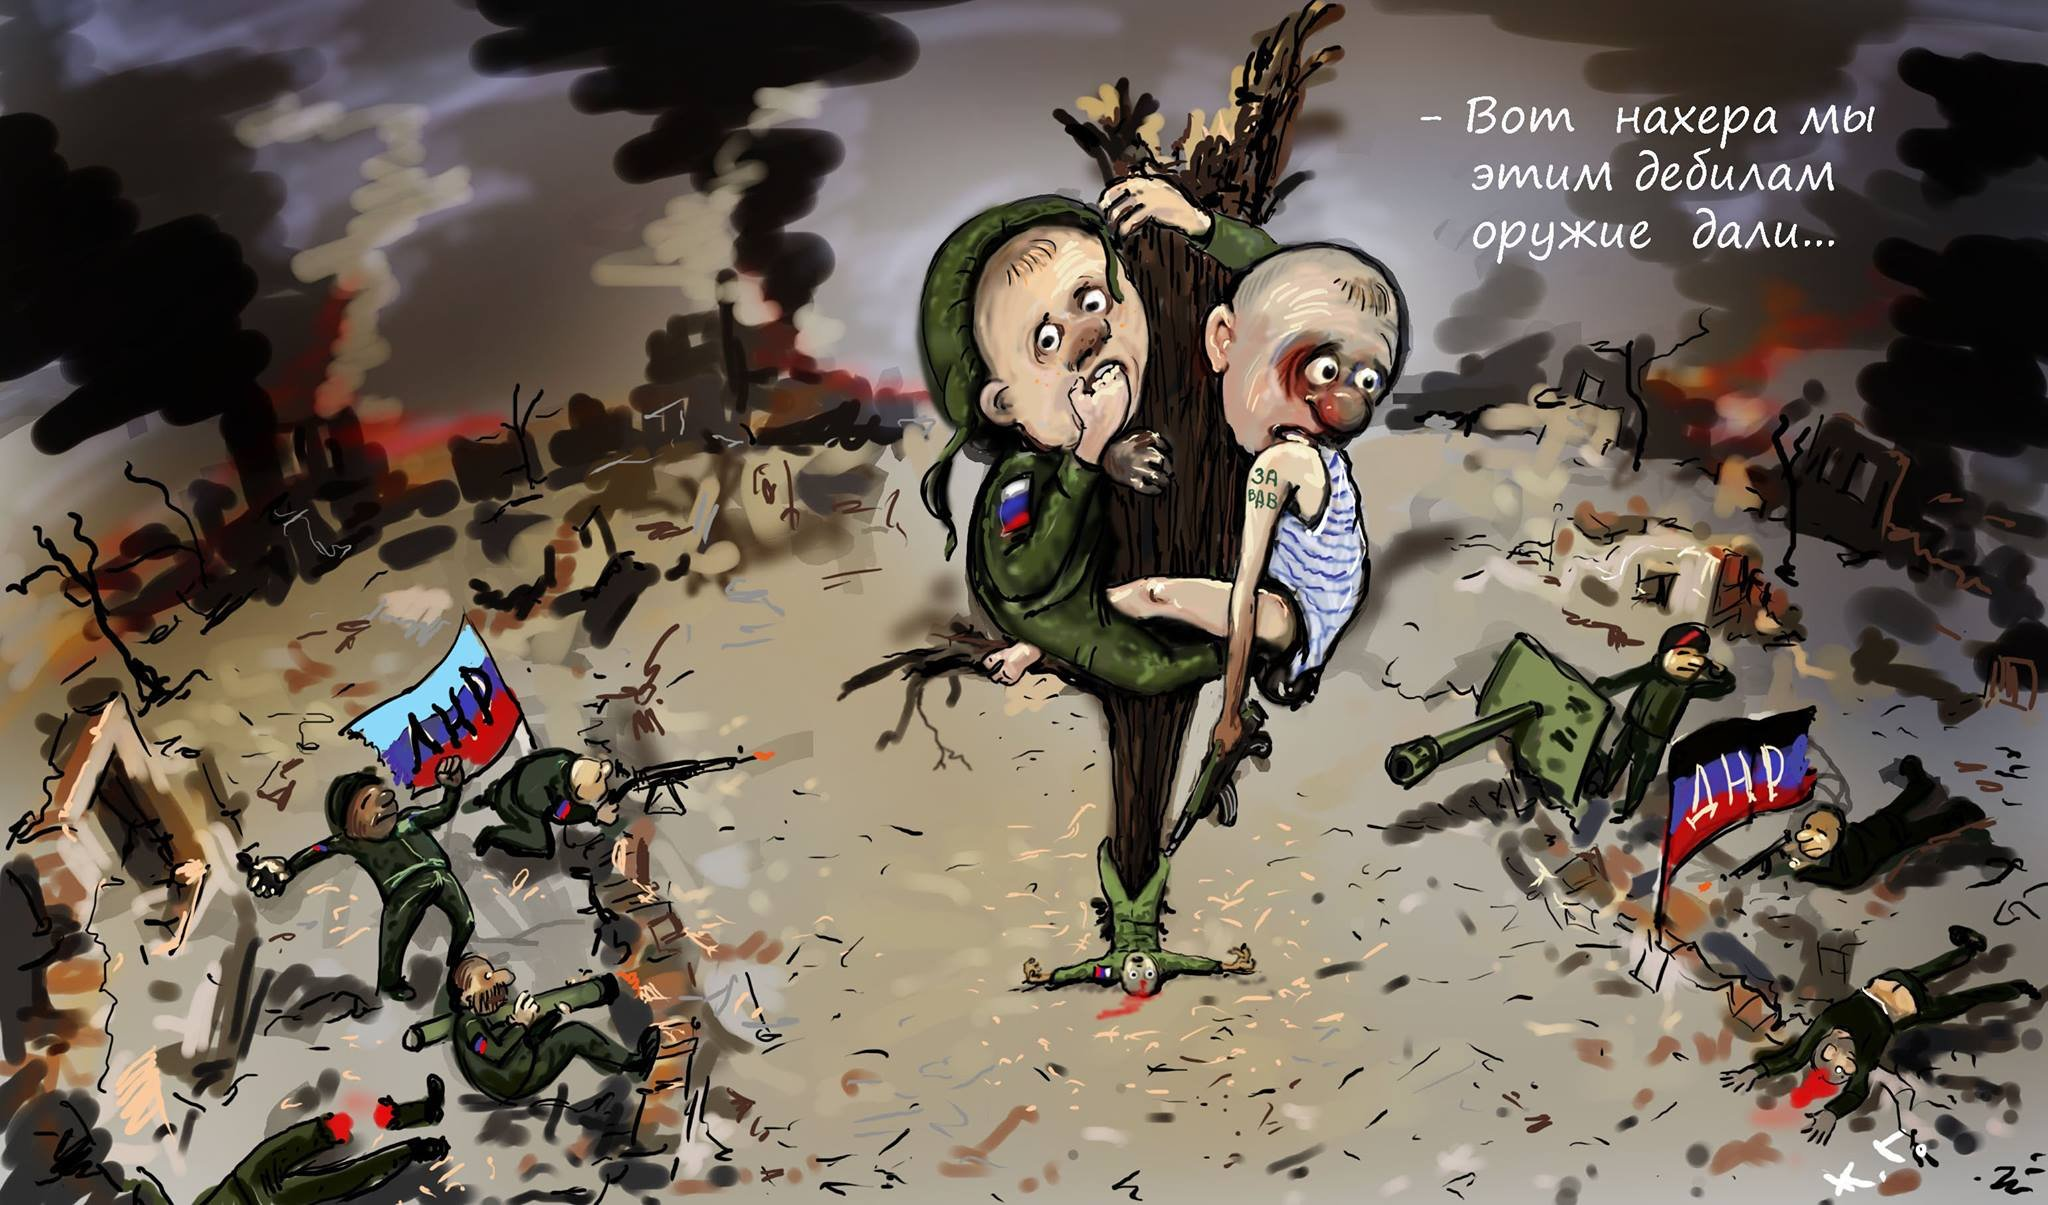 При разборках террористов с казаками Козицына в Антраците уничтожено 18 боевиков, - СНБО - Цензор.НЕТ 4669